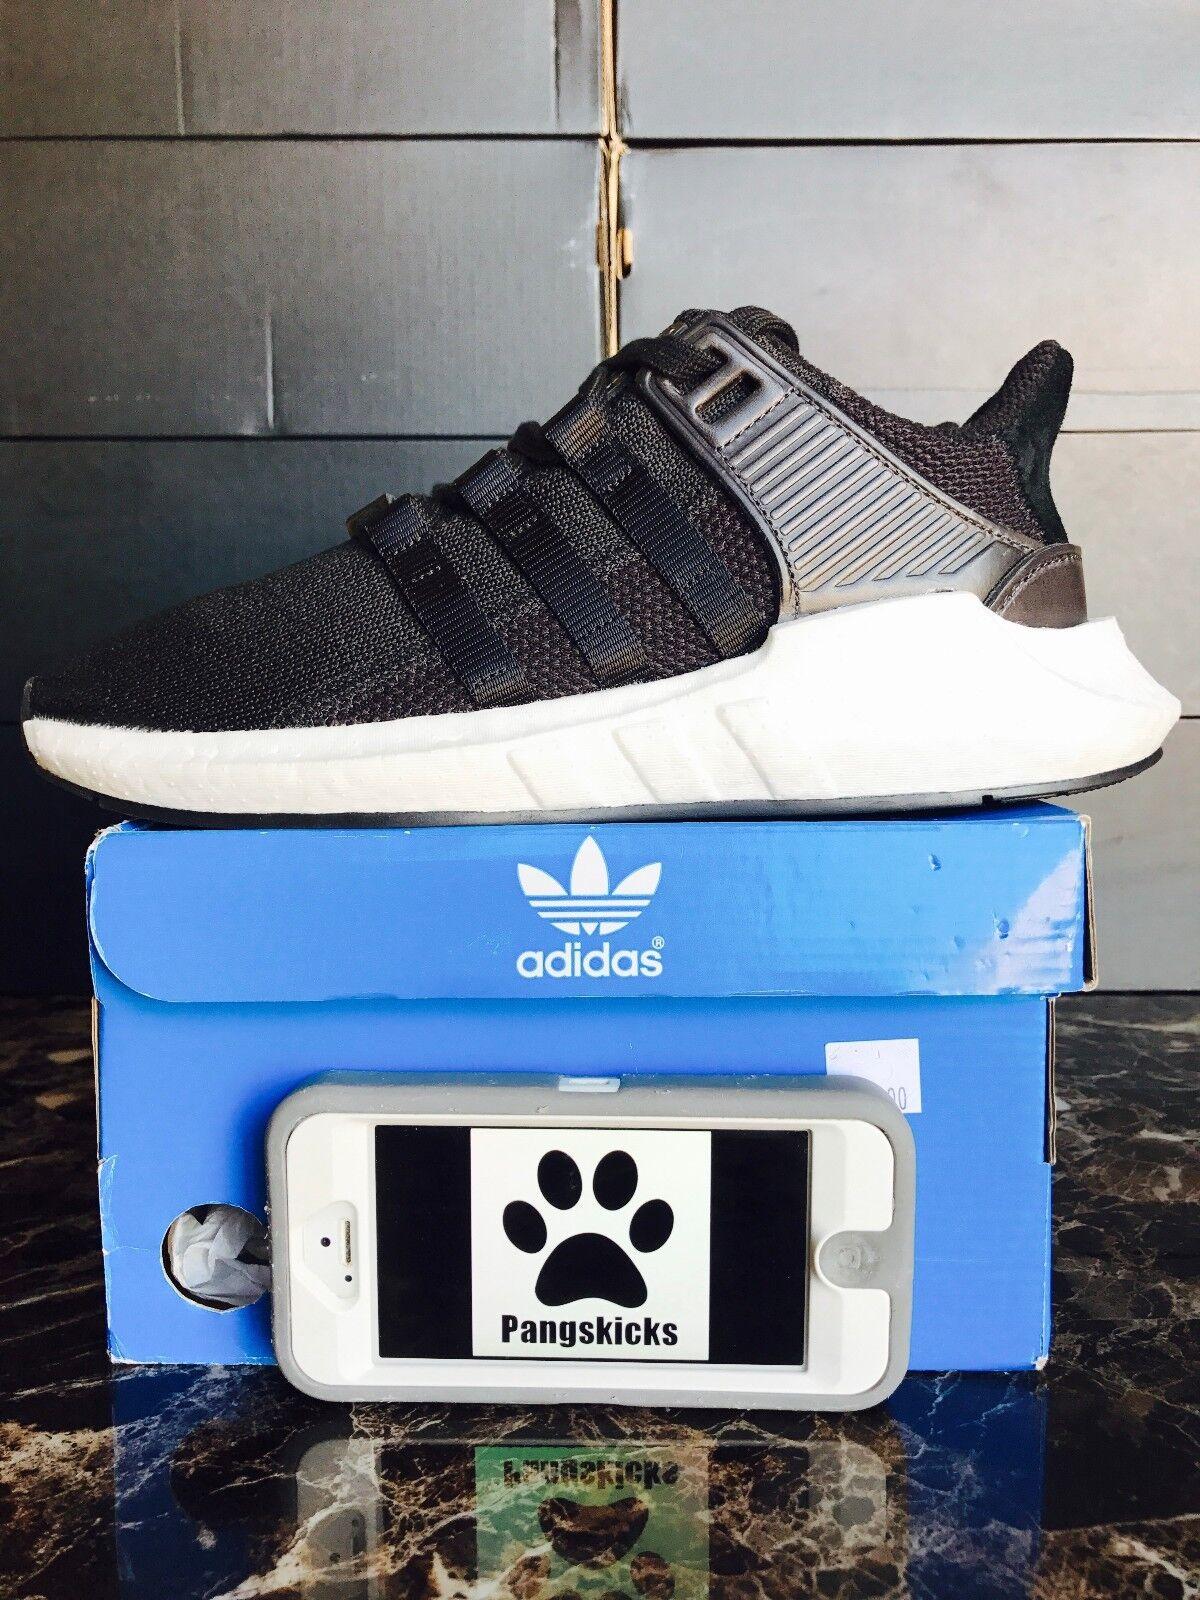 Adidas lavorato